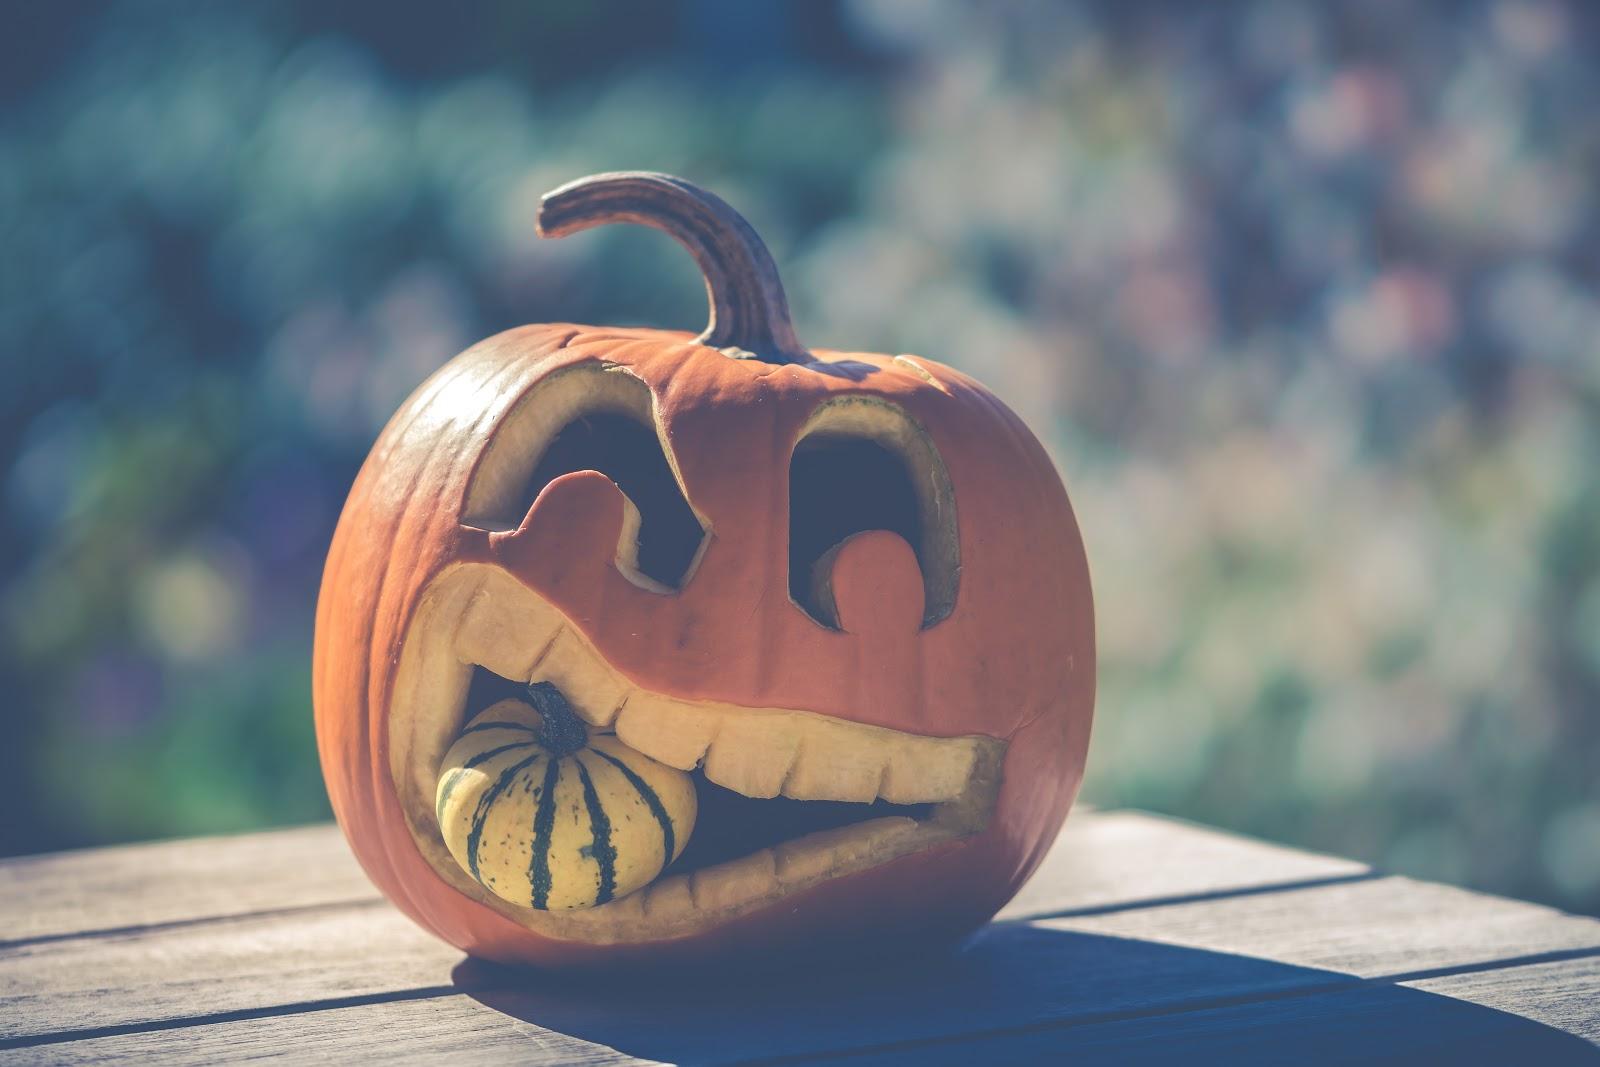 Best Ghost Adventures Episodes For Halloween